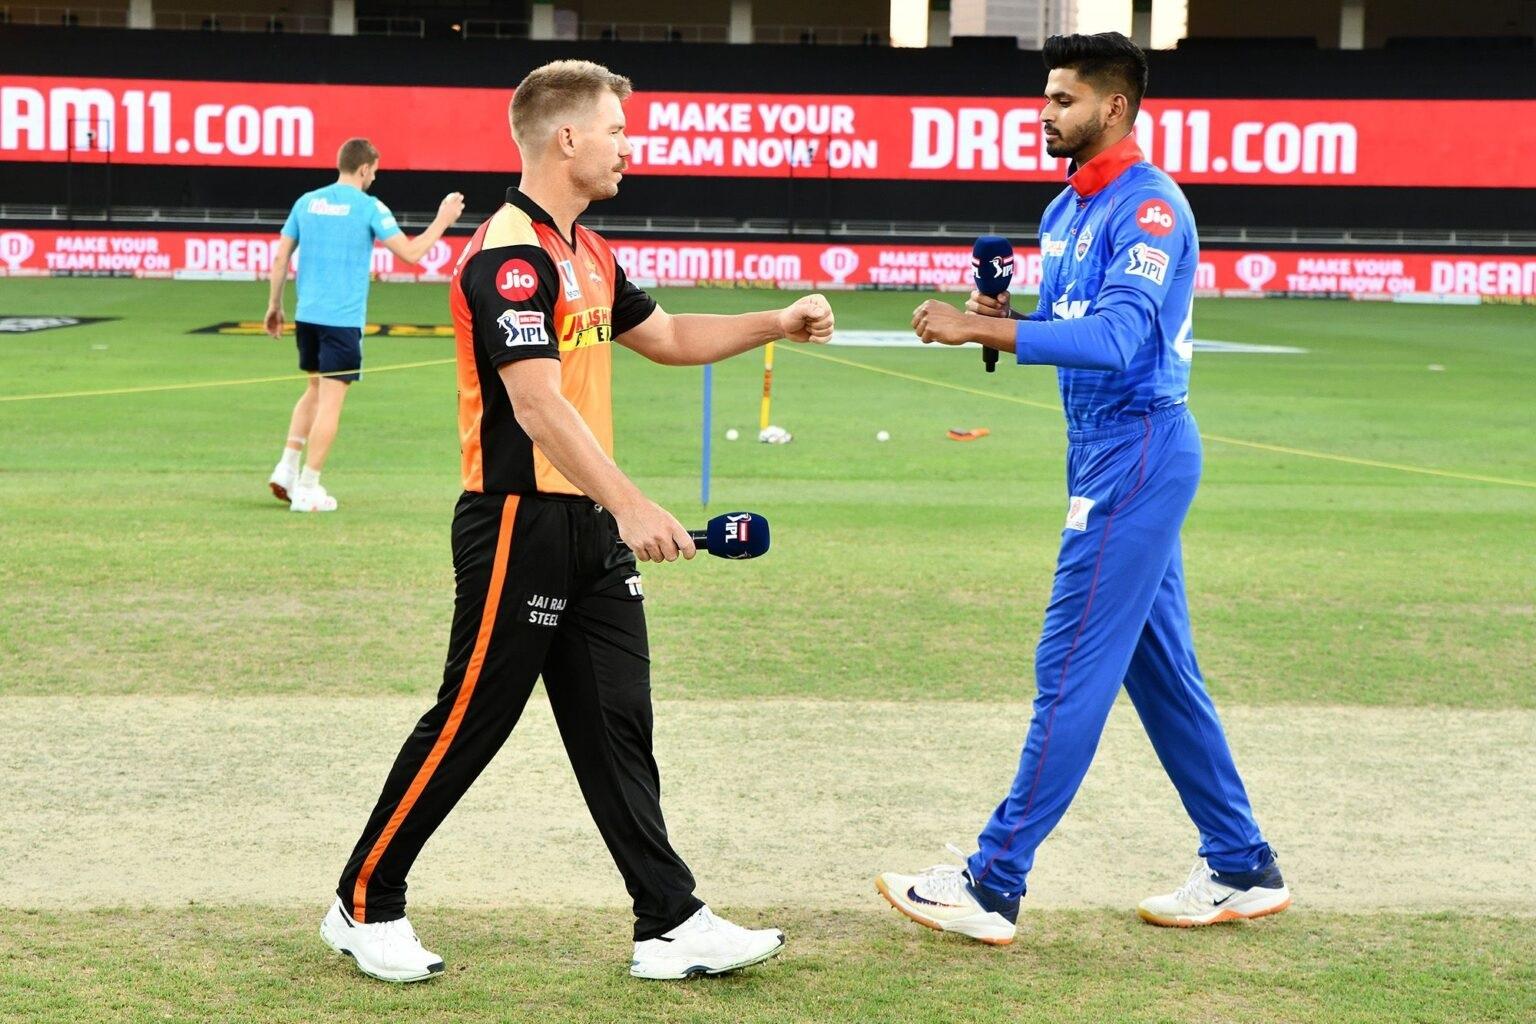 DCvsSRH: শ্রেয়স আইয়ারের এই ভুল ডোবাল দলকে, হায়দ্রাবাদ জিতল ৮৮ রানে 1